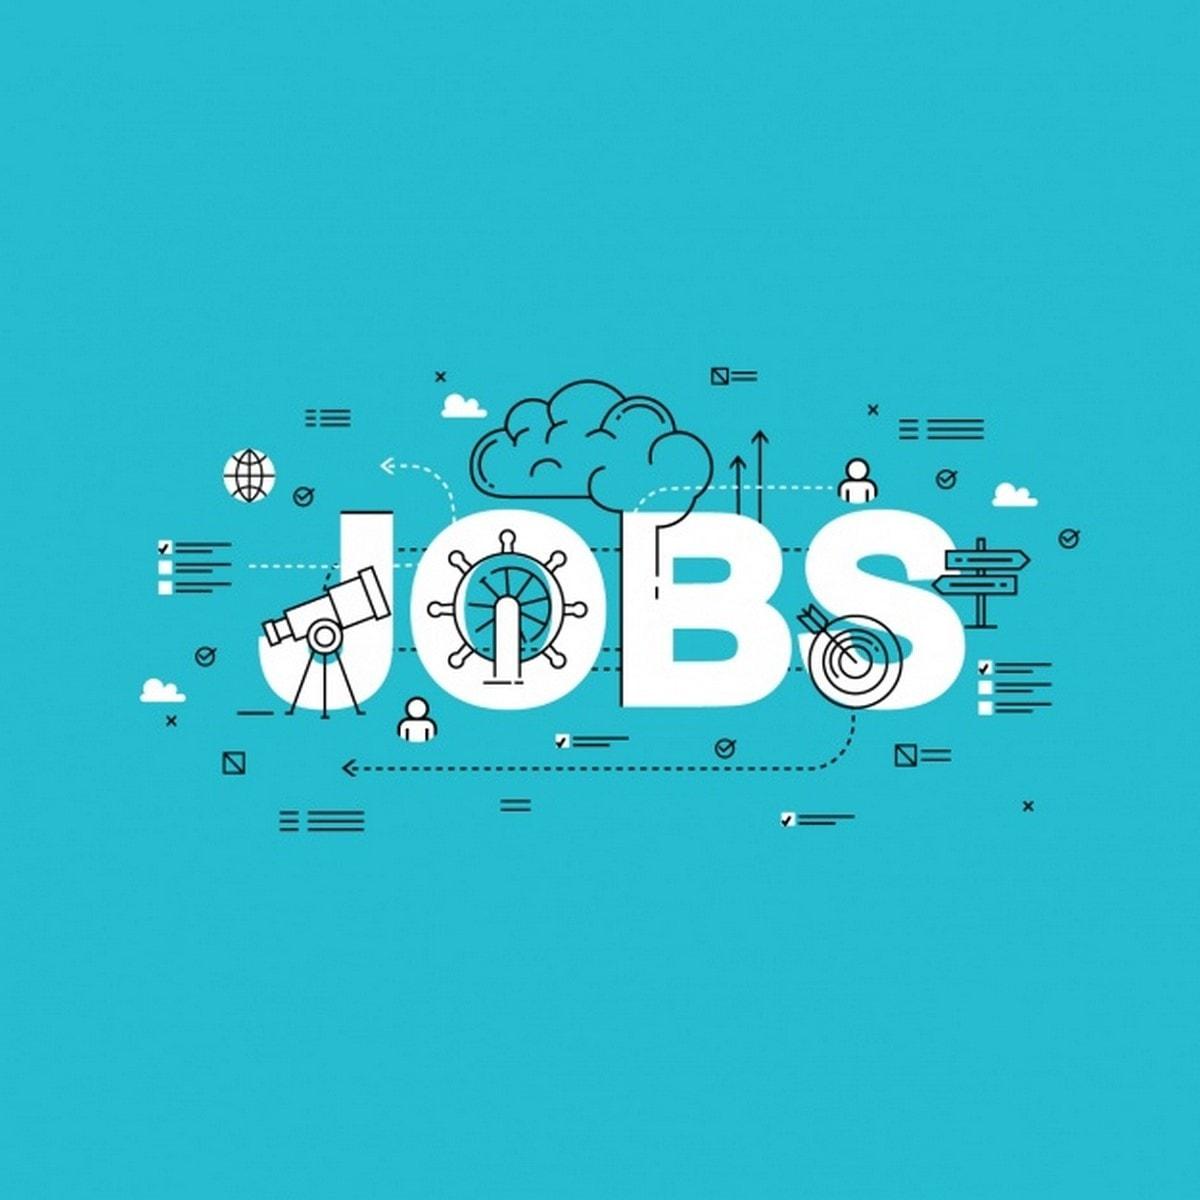 Types of jobs - 27